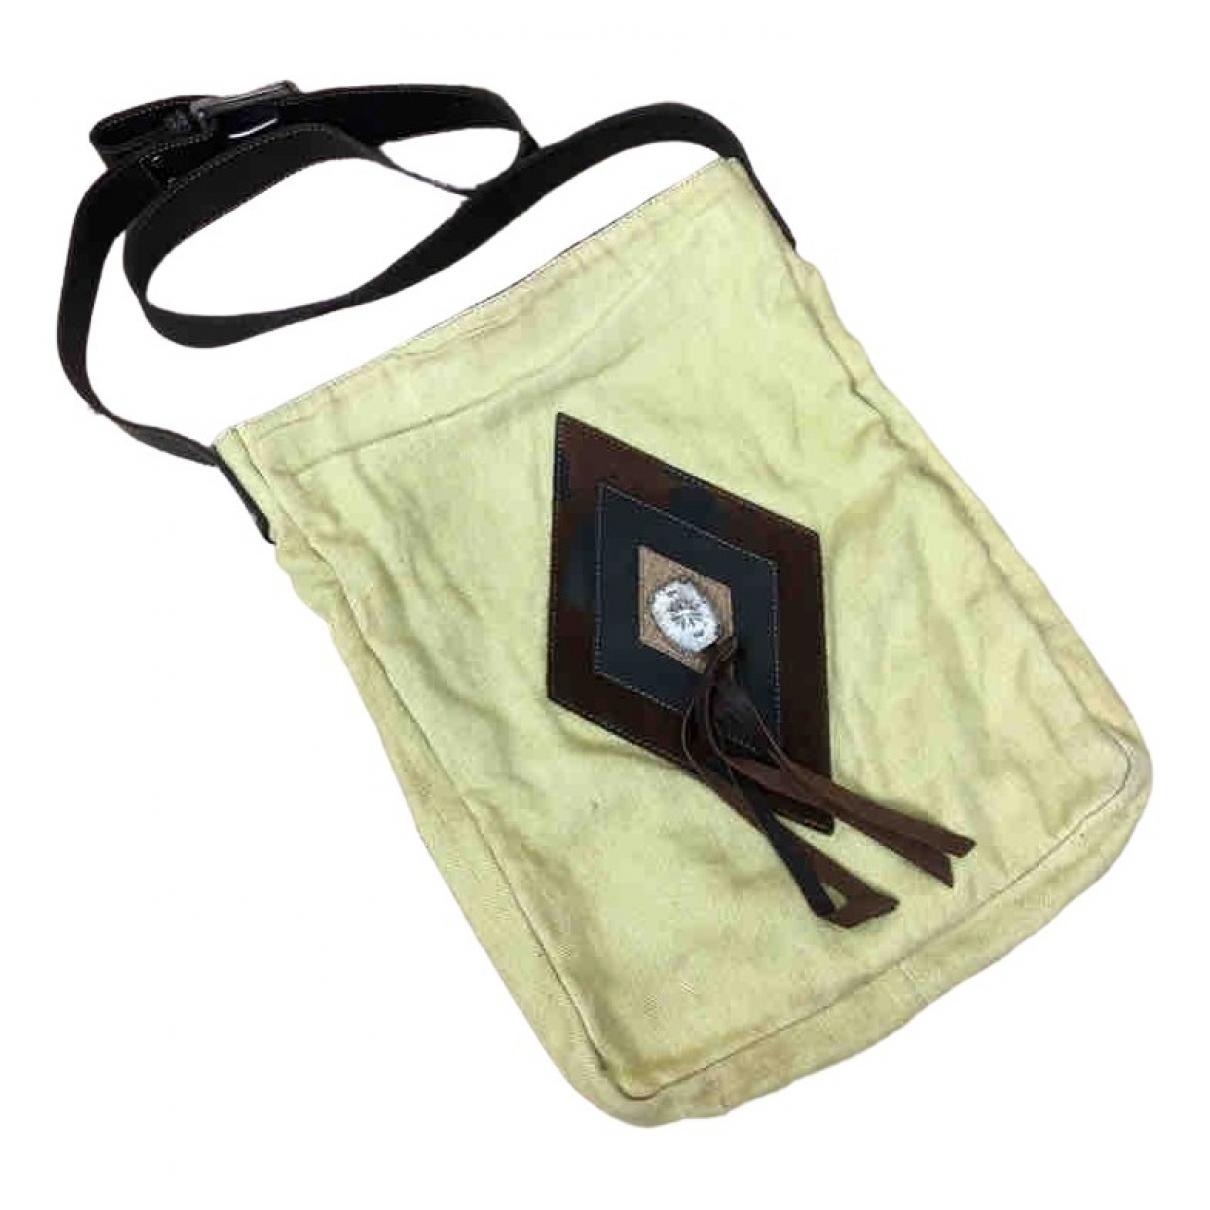 Alchimia Di Ballin \N Yellow Leather handbag for Women \N